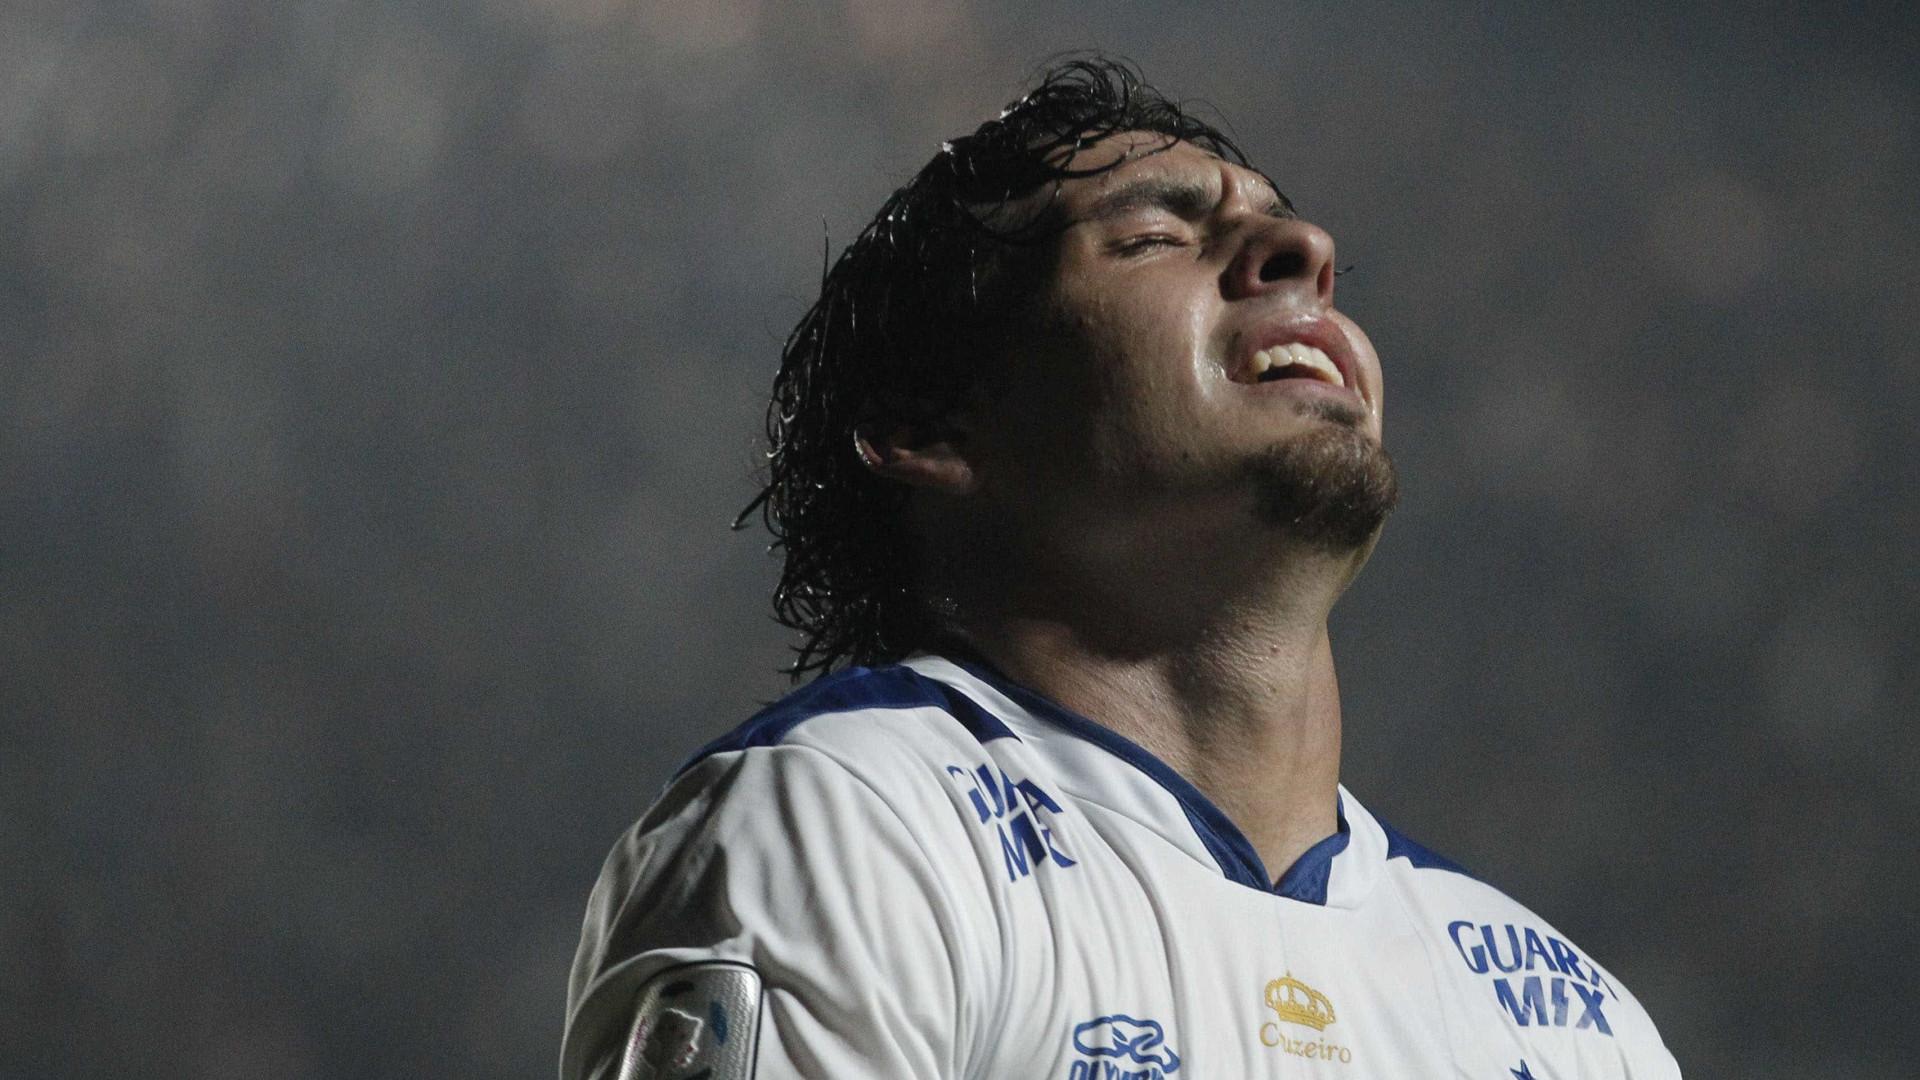 Para fechar grupo, Palmeiras quer emprestar 2 e espera Goulart e Scarpa